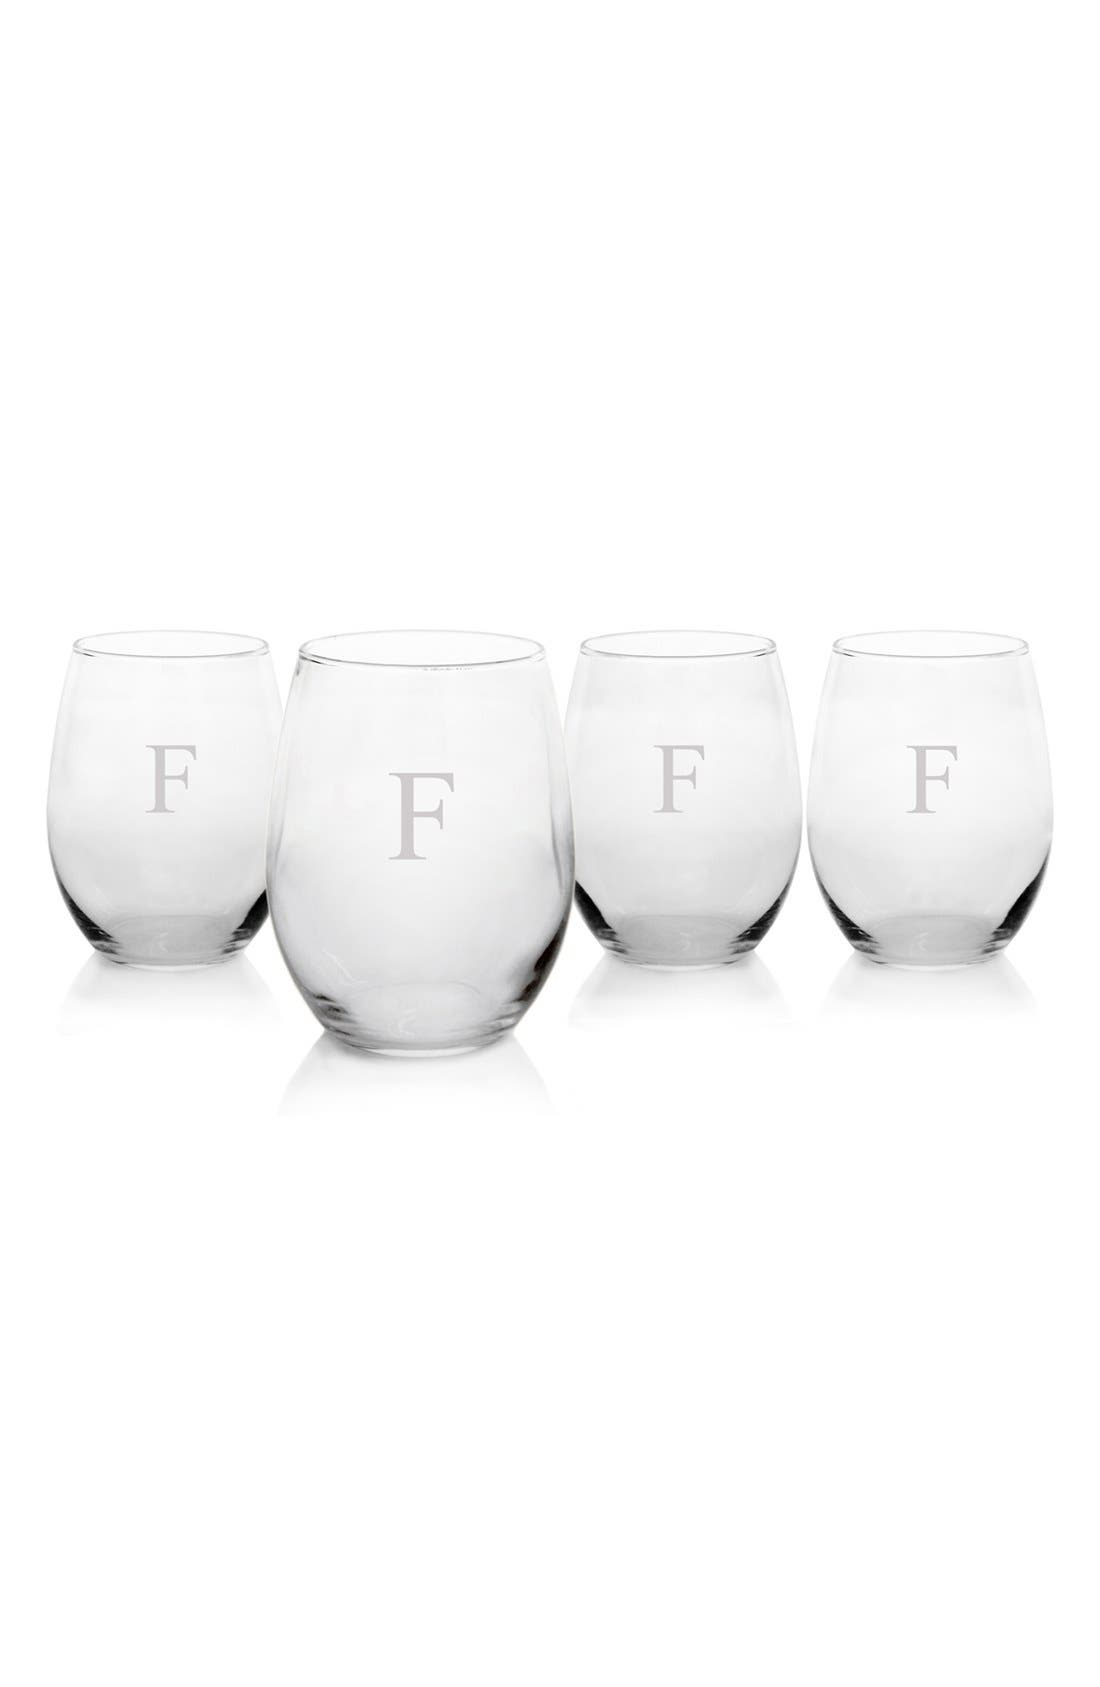 Monogram Set of 4 Stemless Wine Glasses,                             Main thumbnail 1, color,                             965